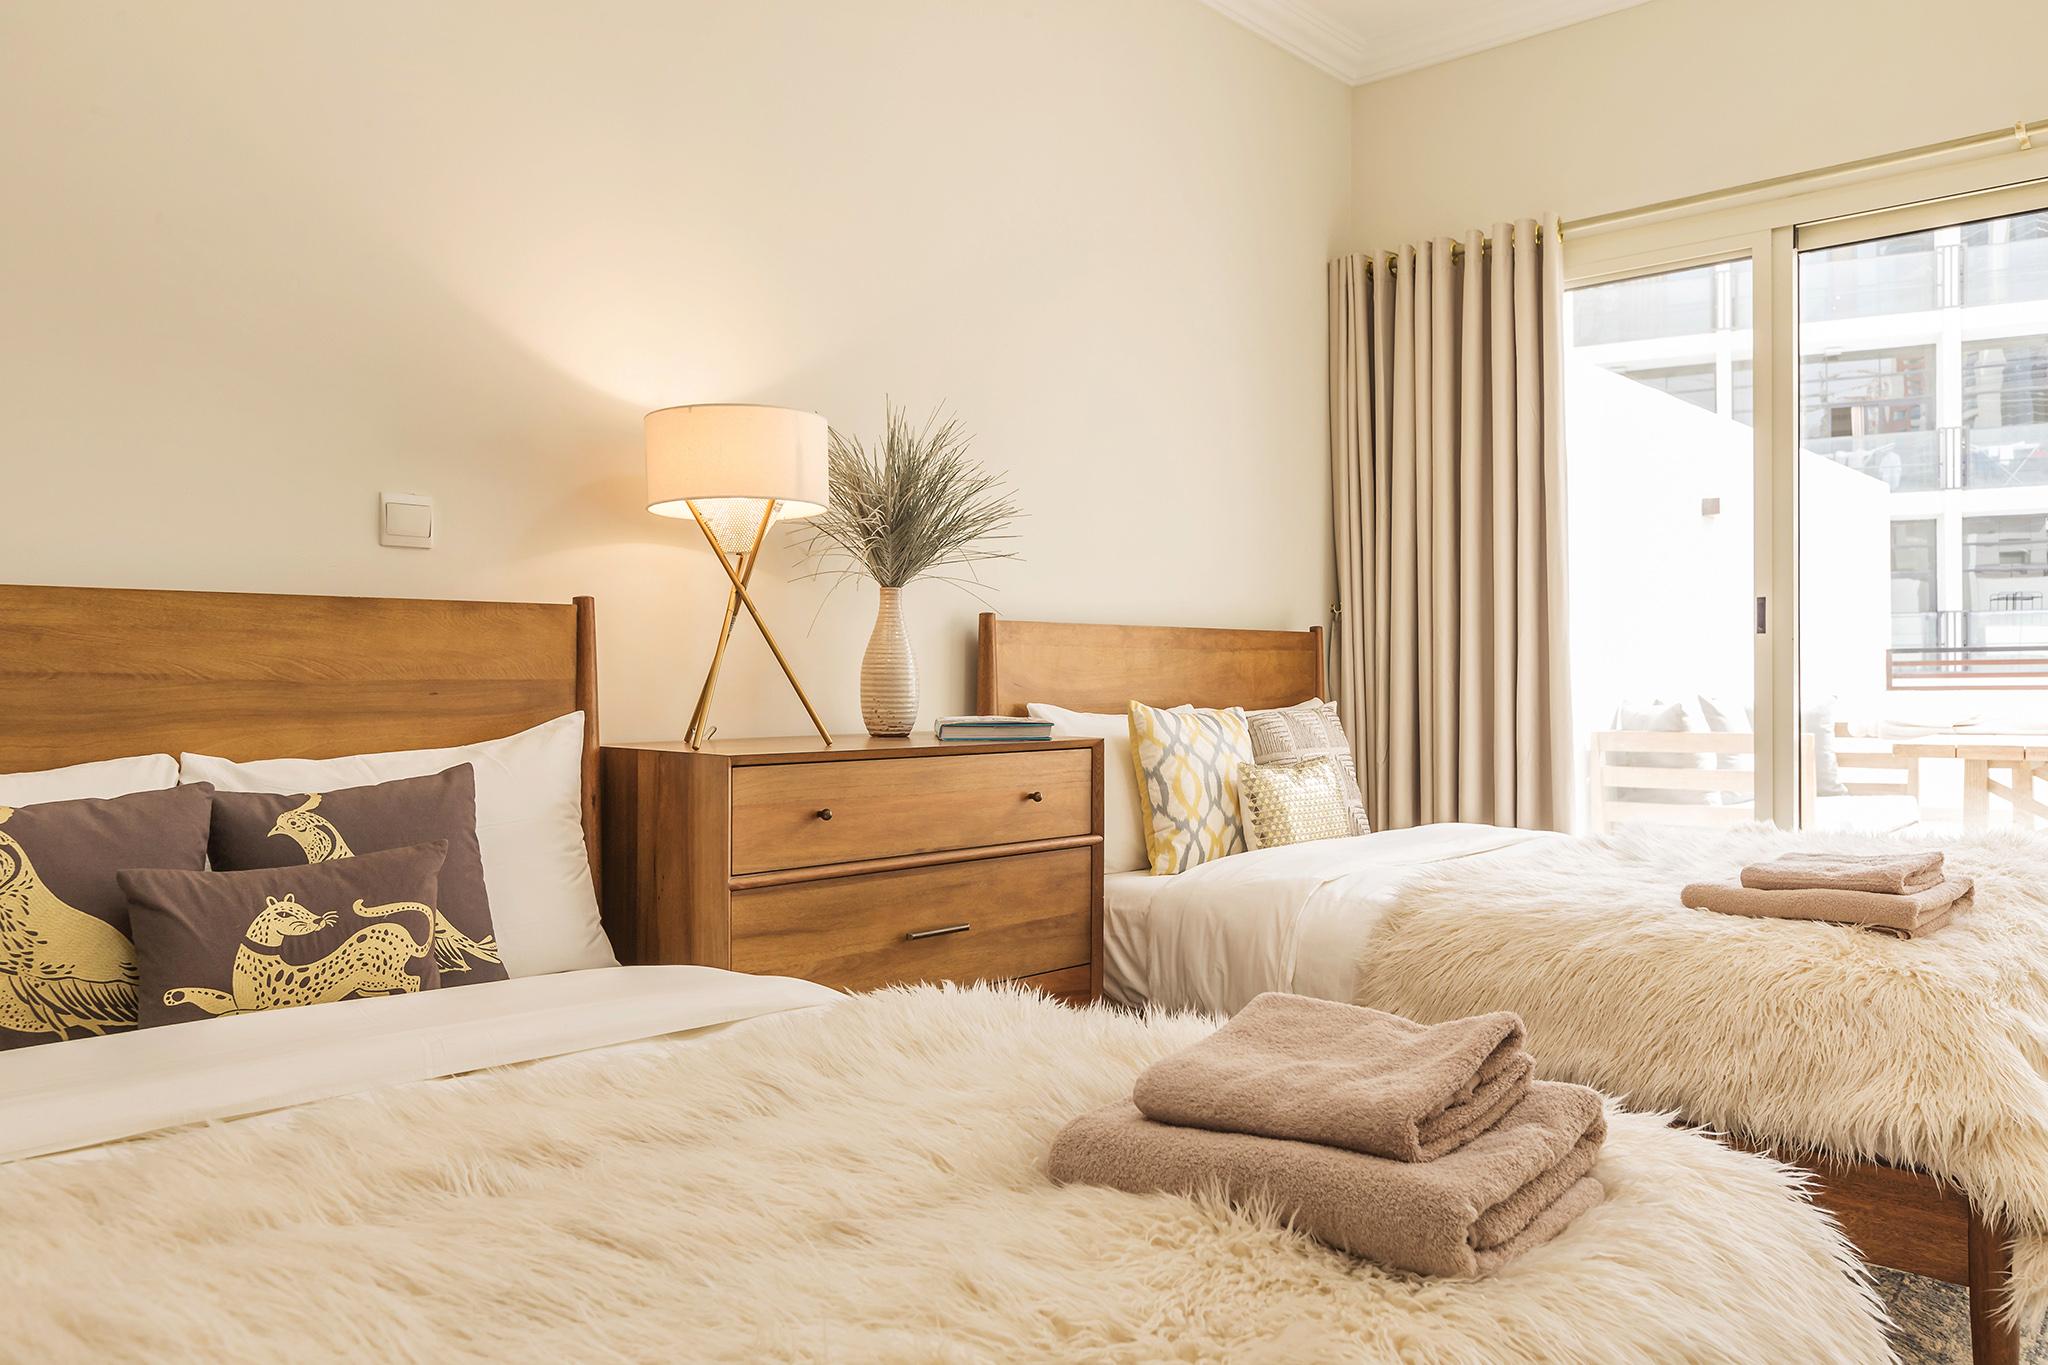 Twin bedroom with lavish design